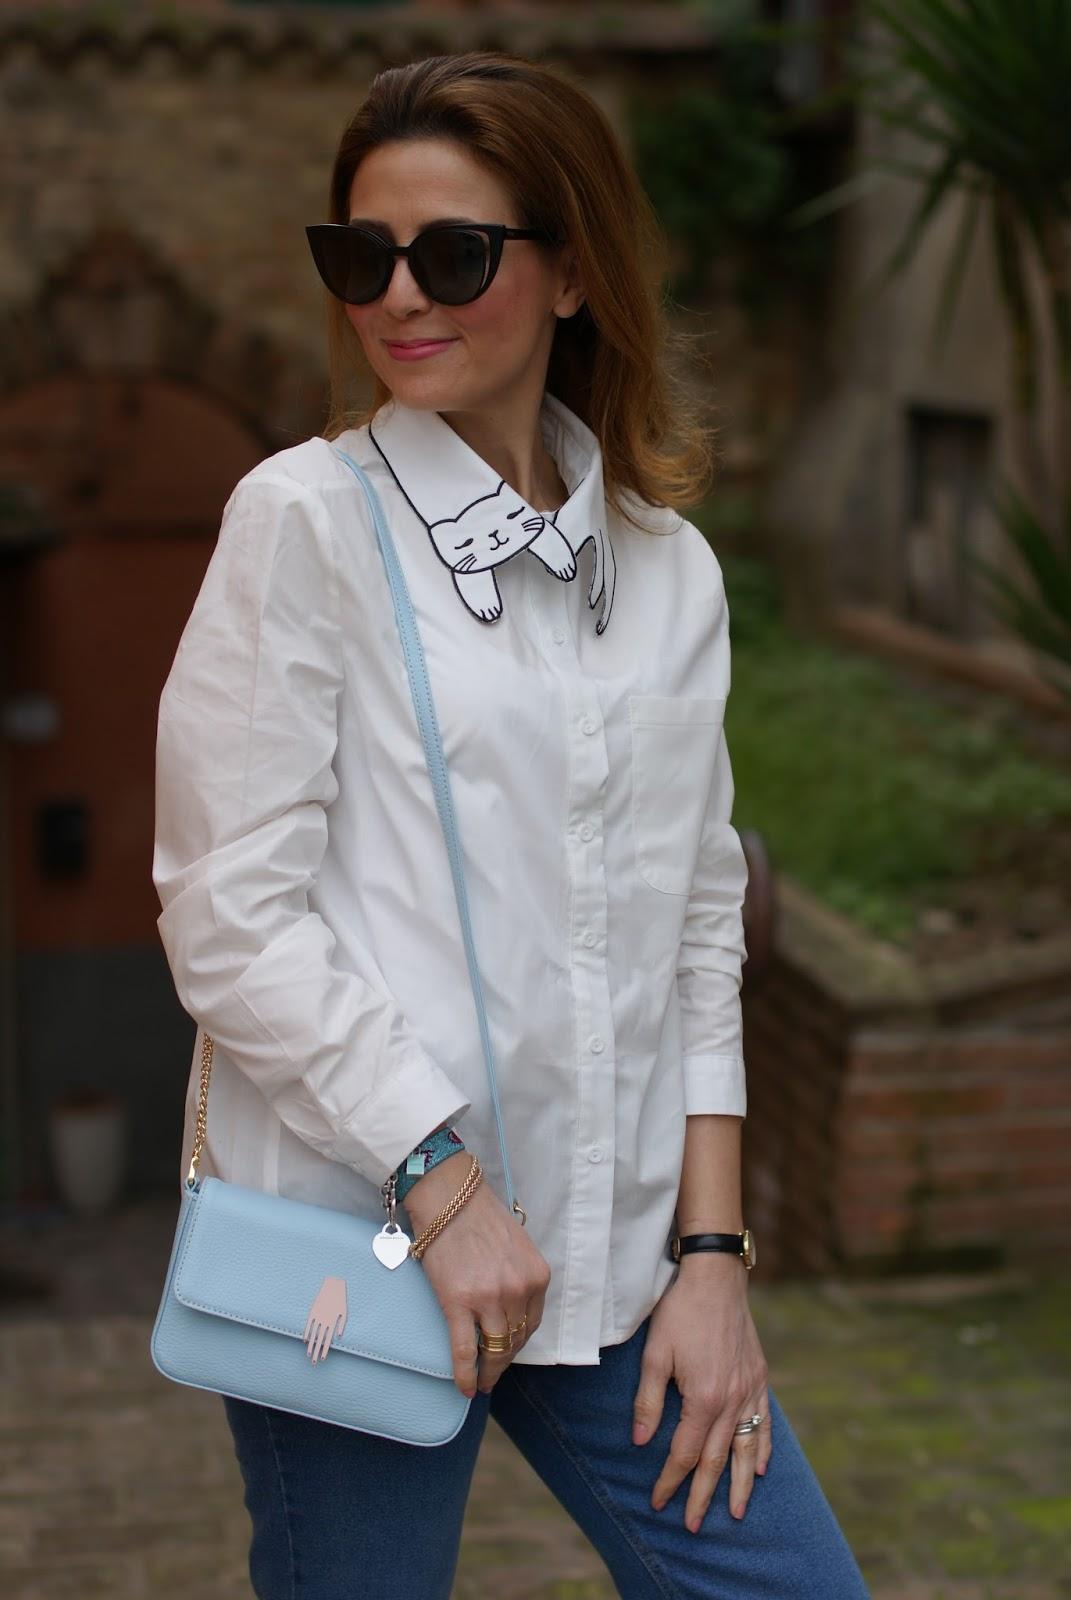 White cat collar shirt, Lazzari store borsa on Fashion and Cookies fashion blog, fashion blogger style